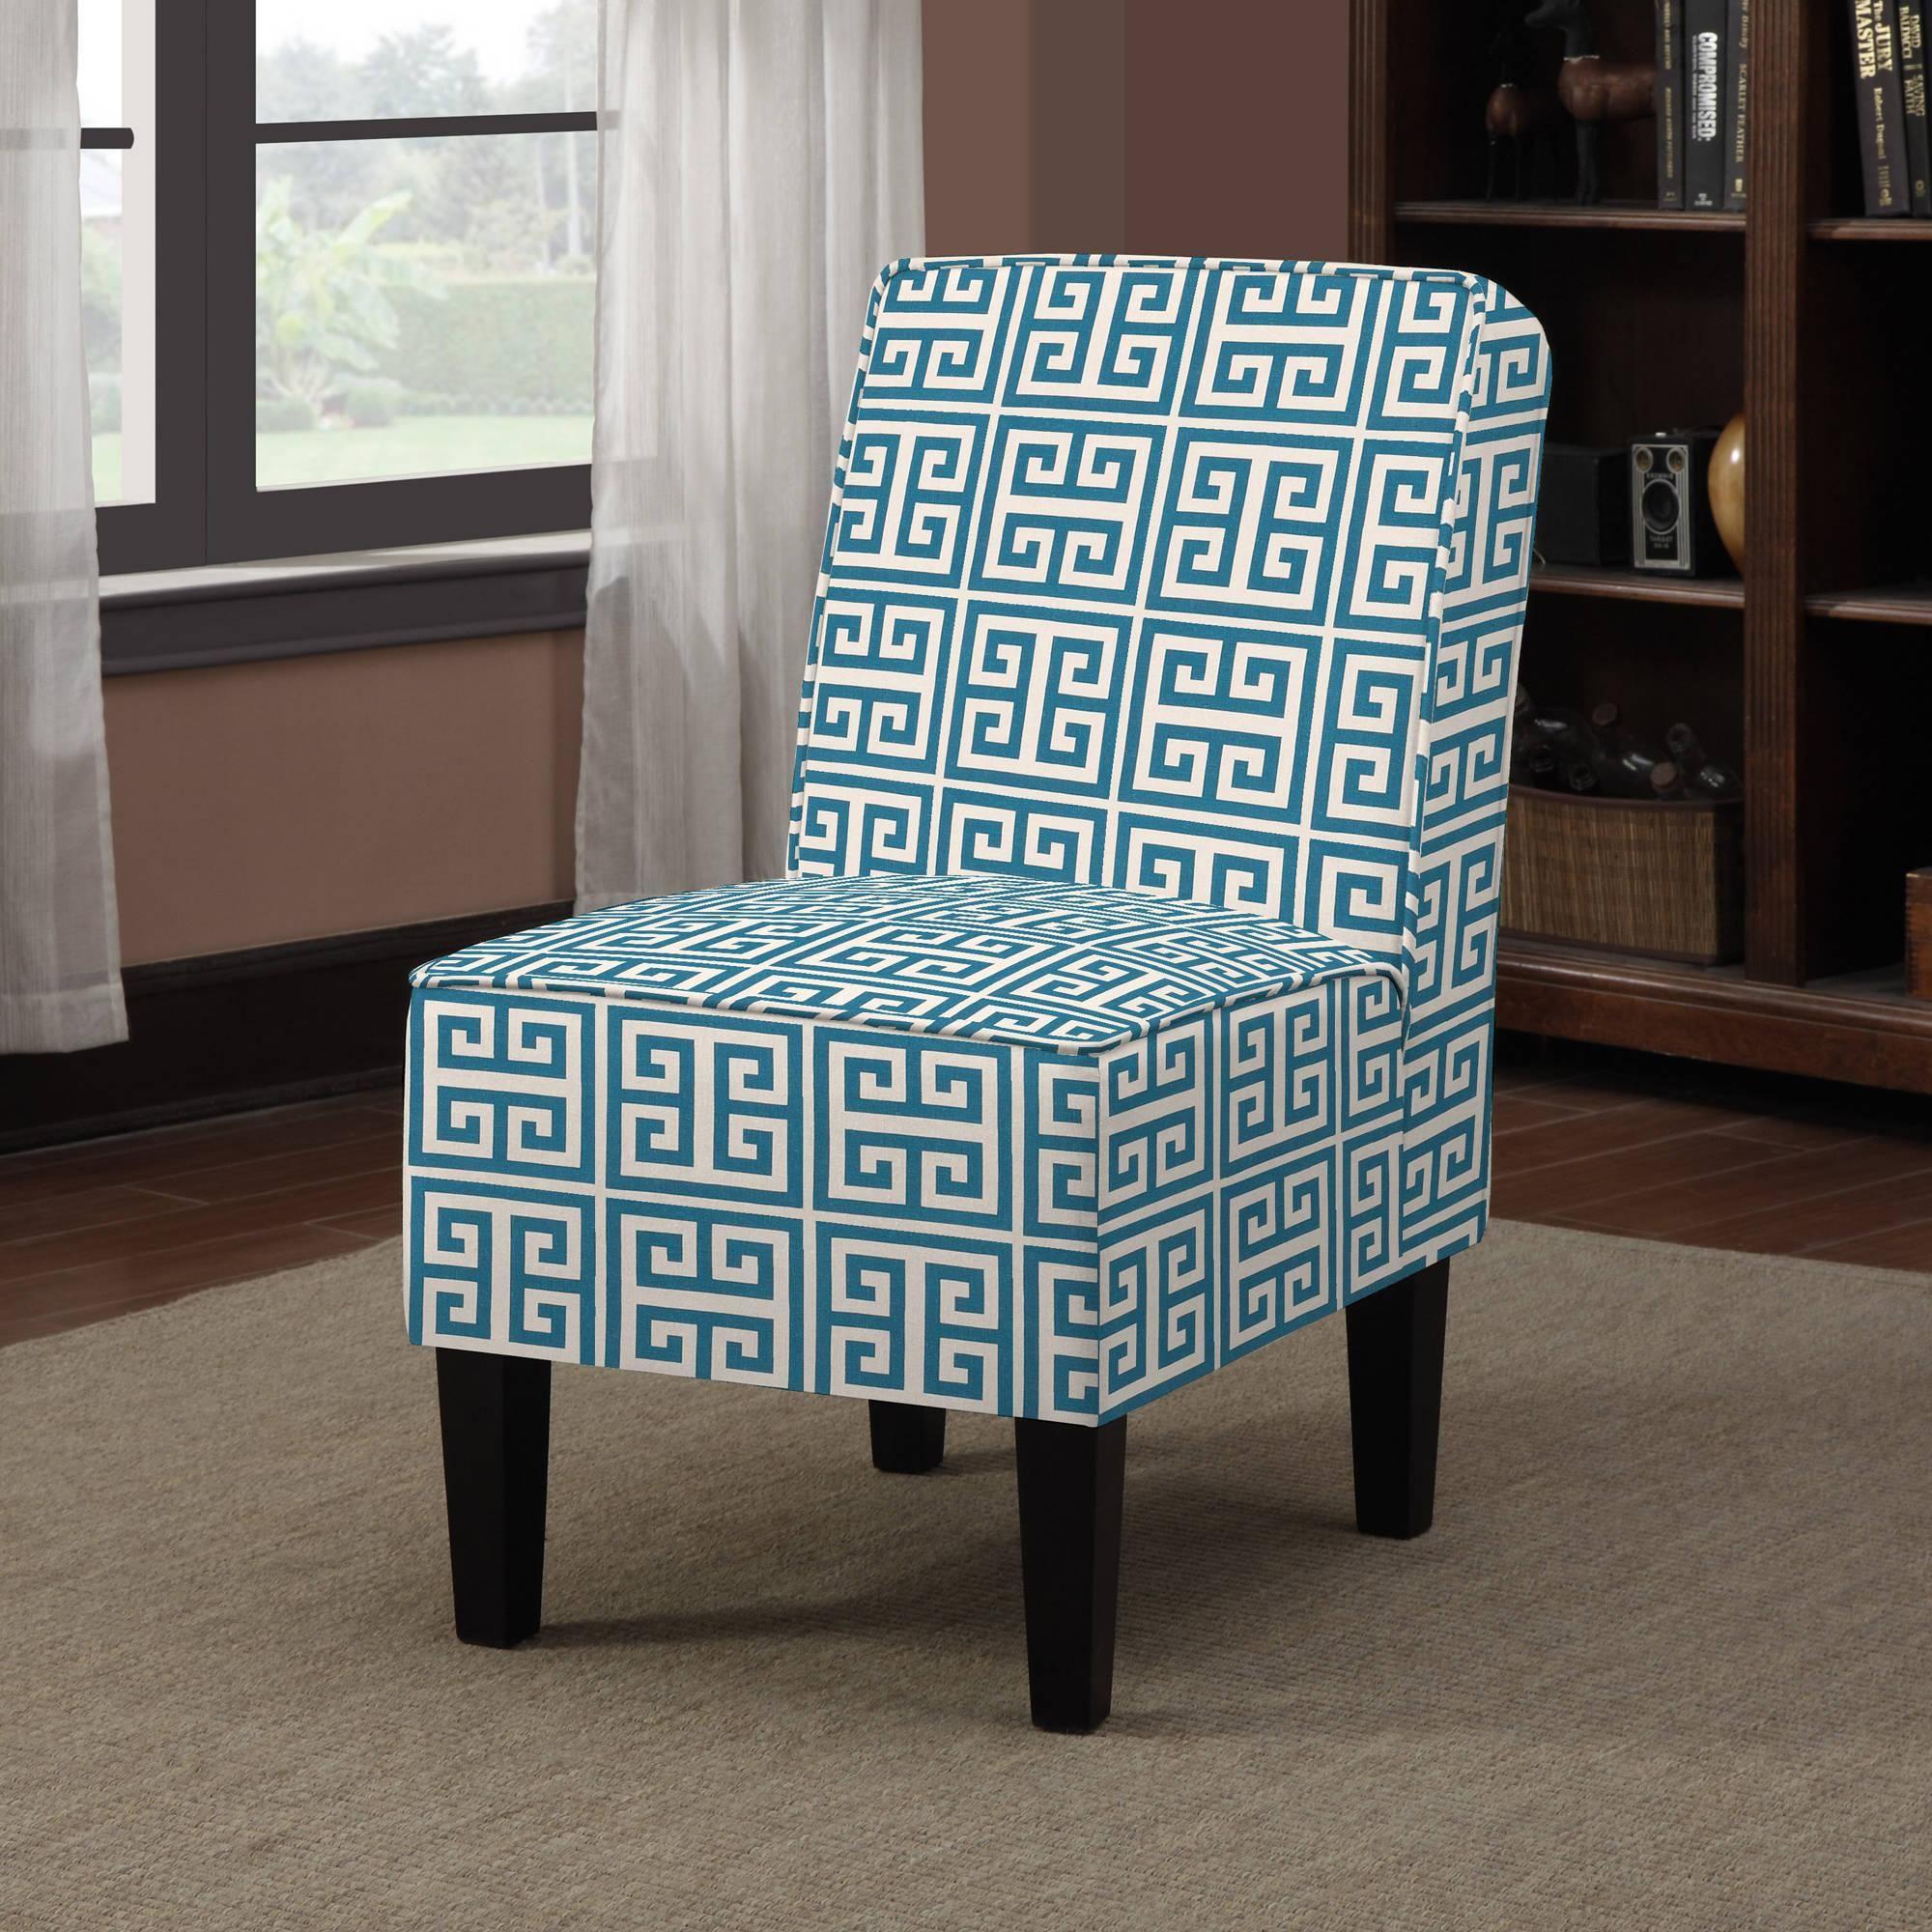 Living Room Furniture Walmart: Orange Living Room Chairs : Living Room Furniture